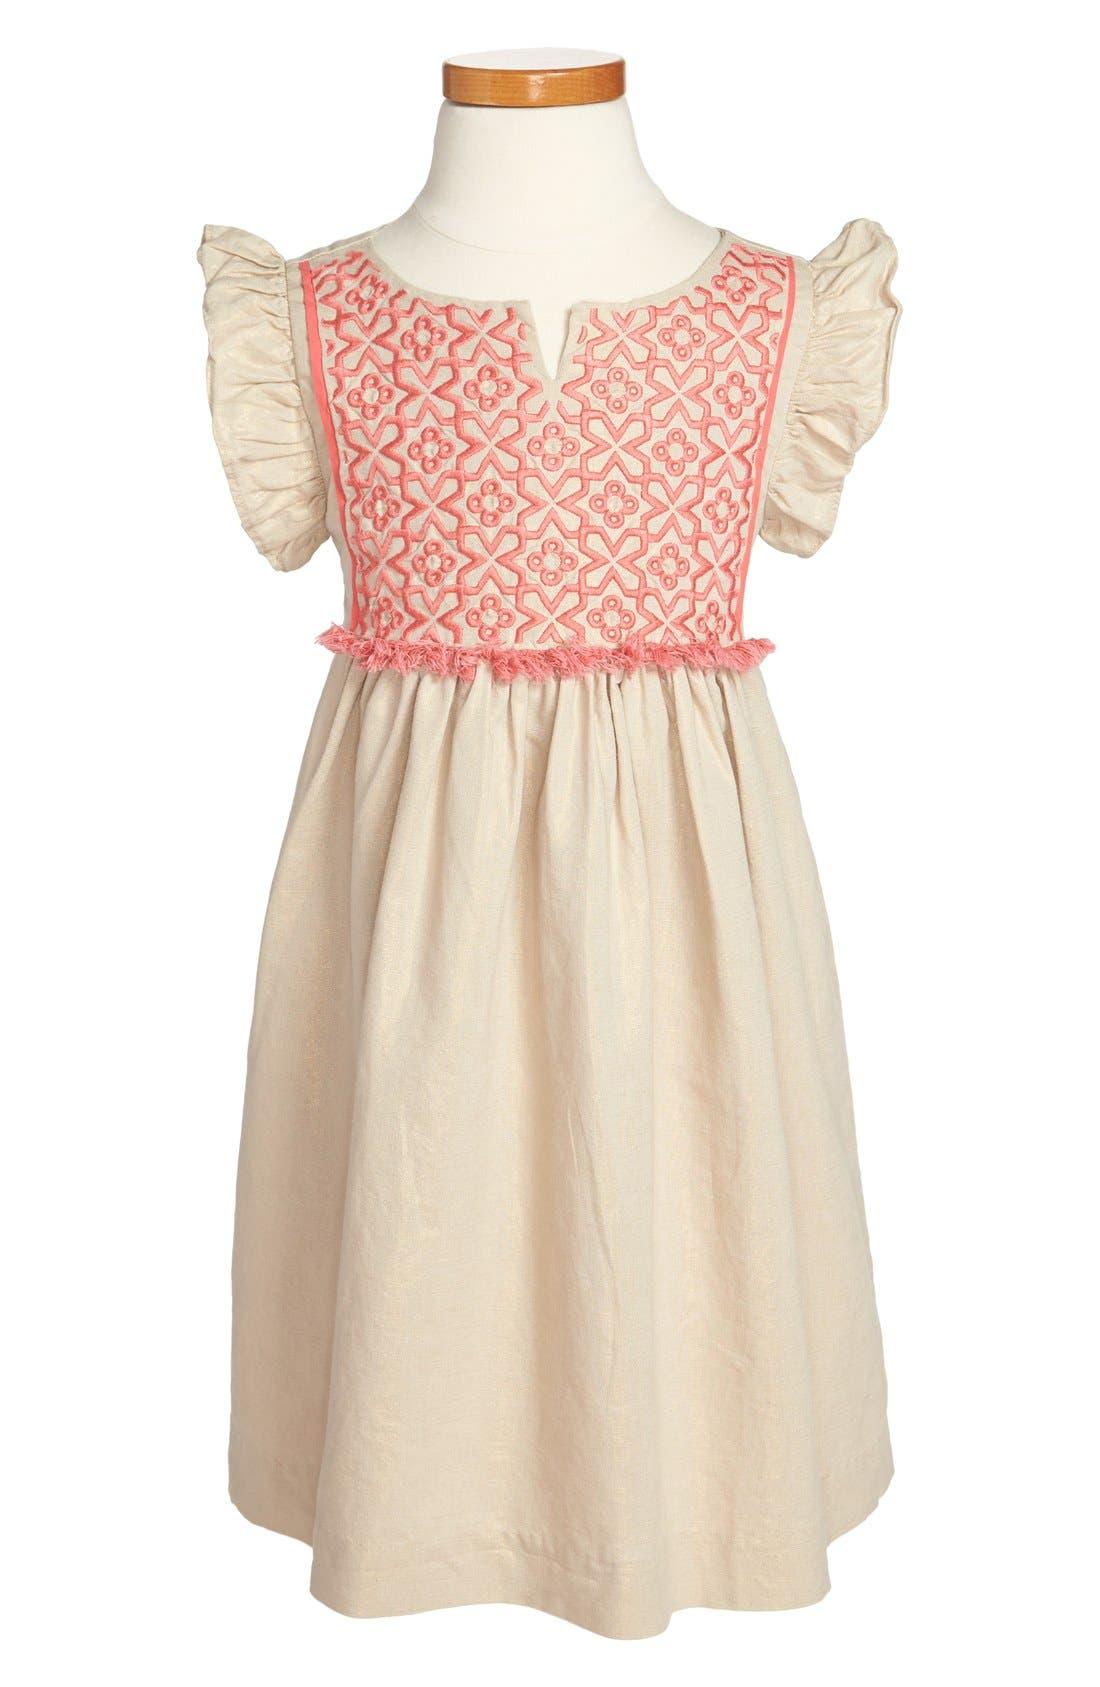 Alternate Image 1 Selected - Tea Collection 'Nabila Sparkle' Flutter Sleeve Dress (Toddler Girls, Little Girls & Big Girls)